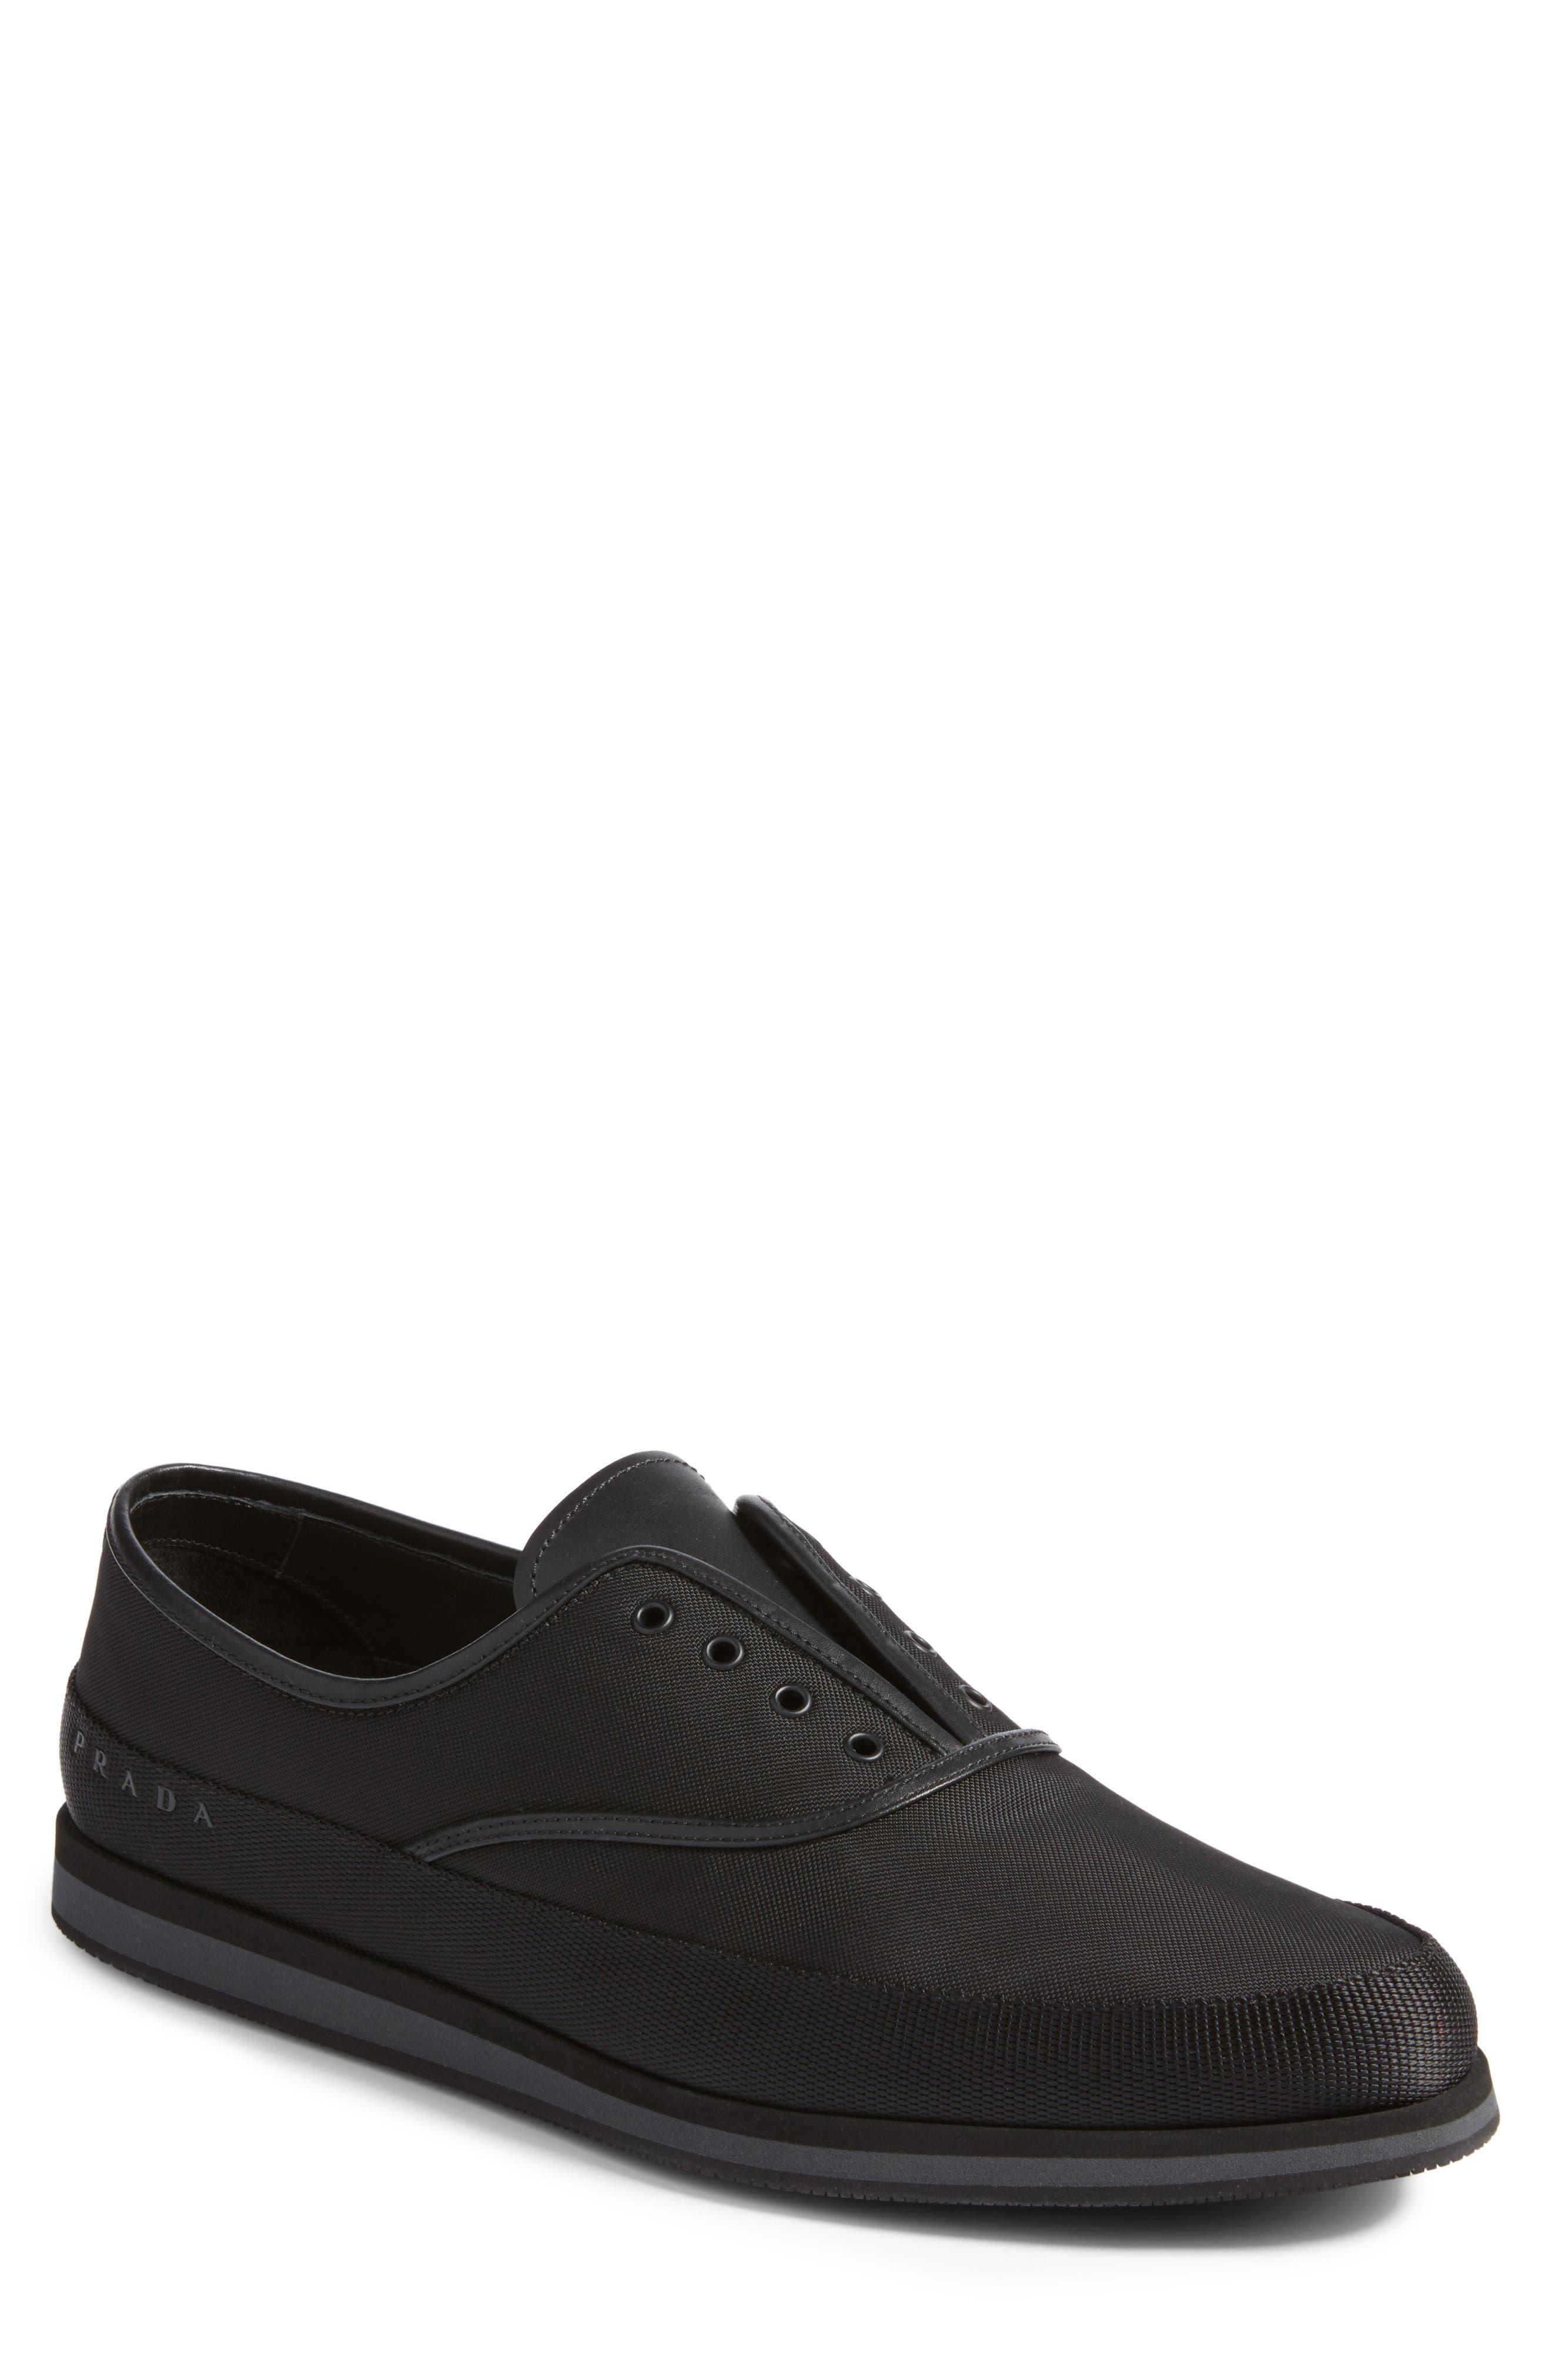 Buy Authentic Prada Shoes Online